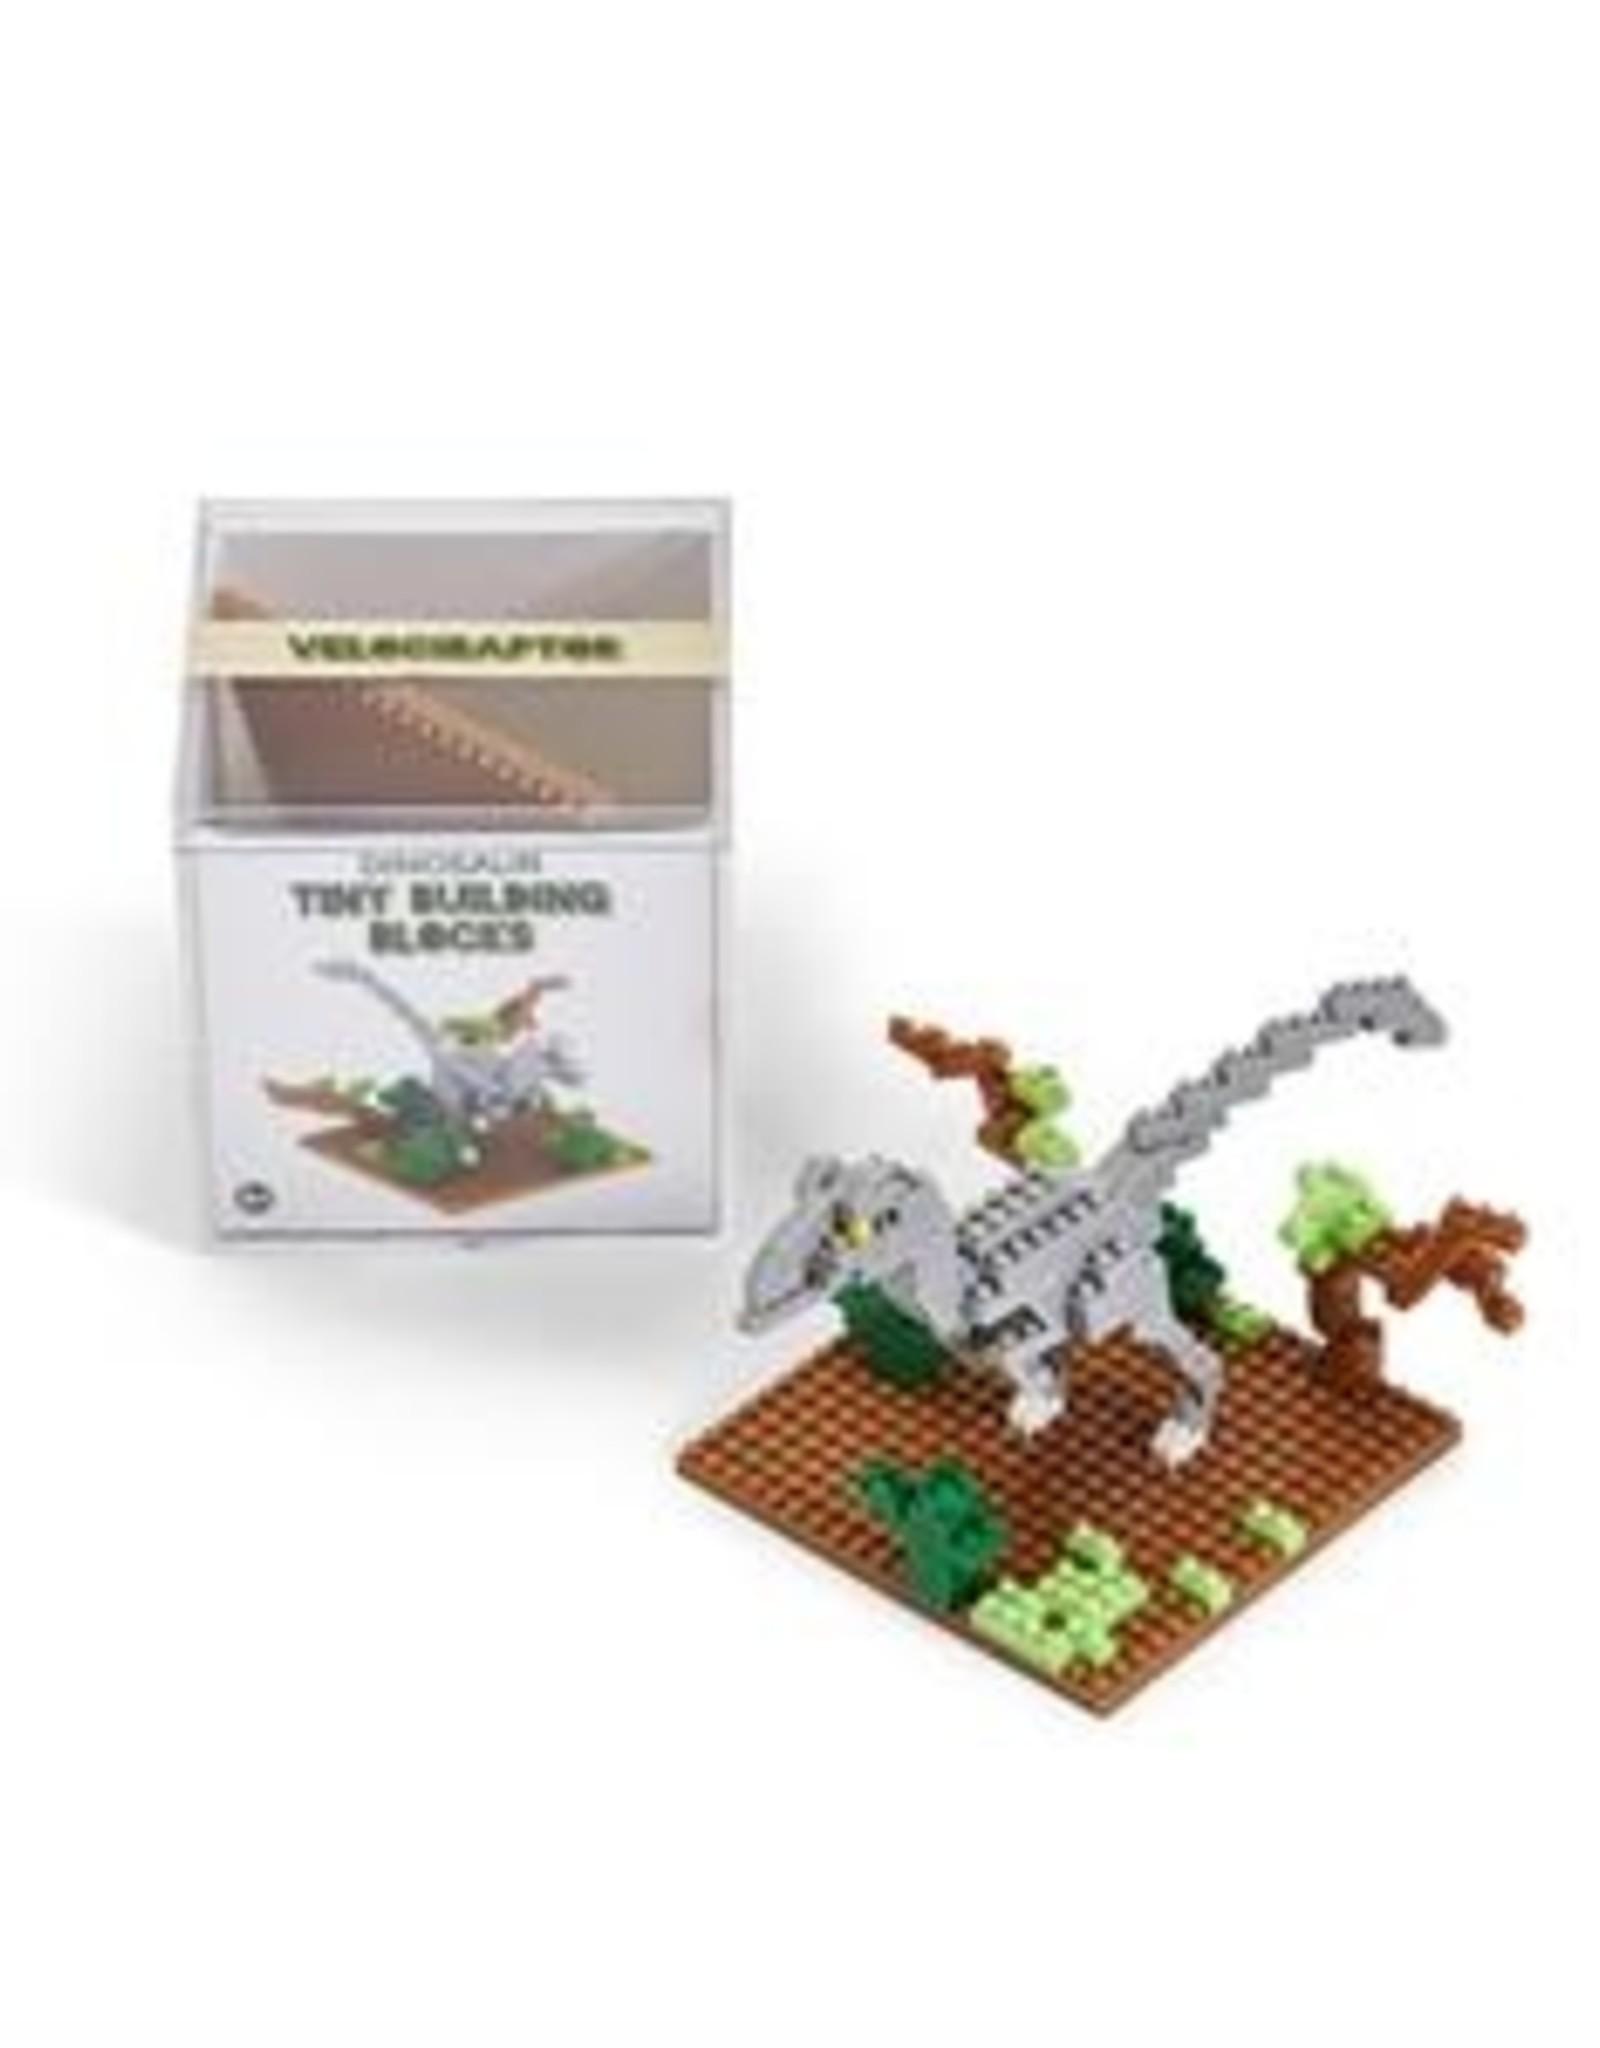 Two's Company Dinosaur Micro Building Blocks